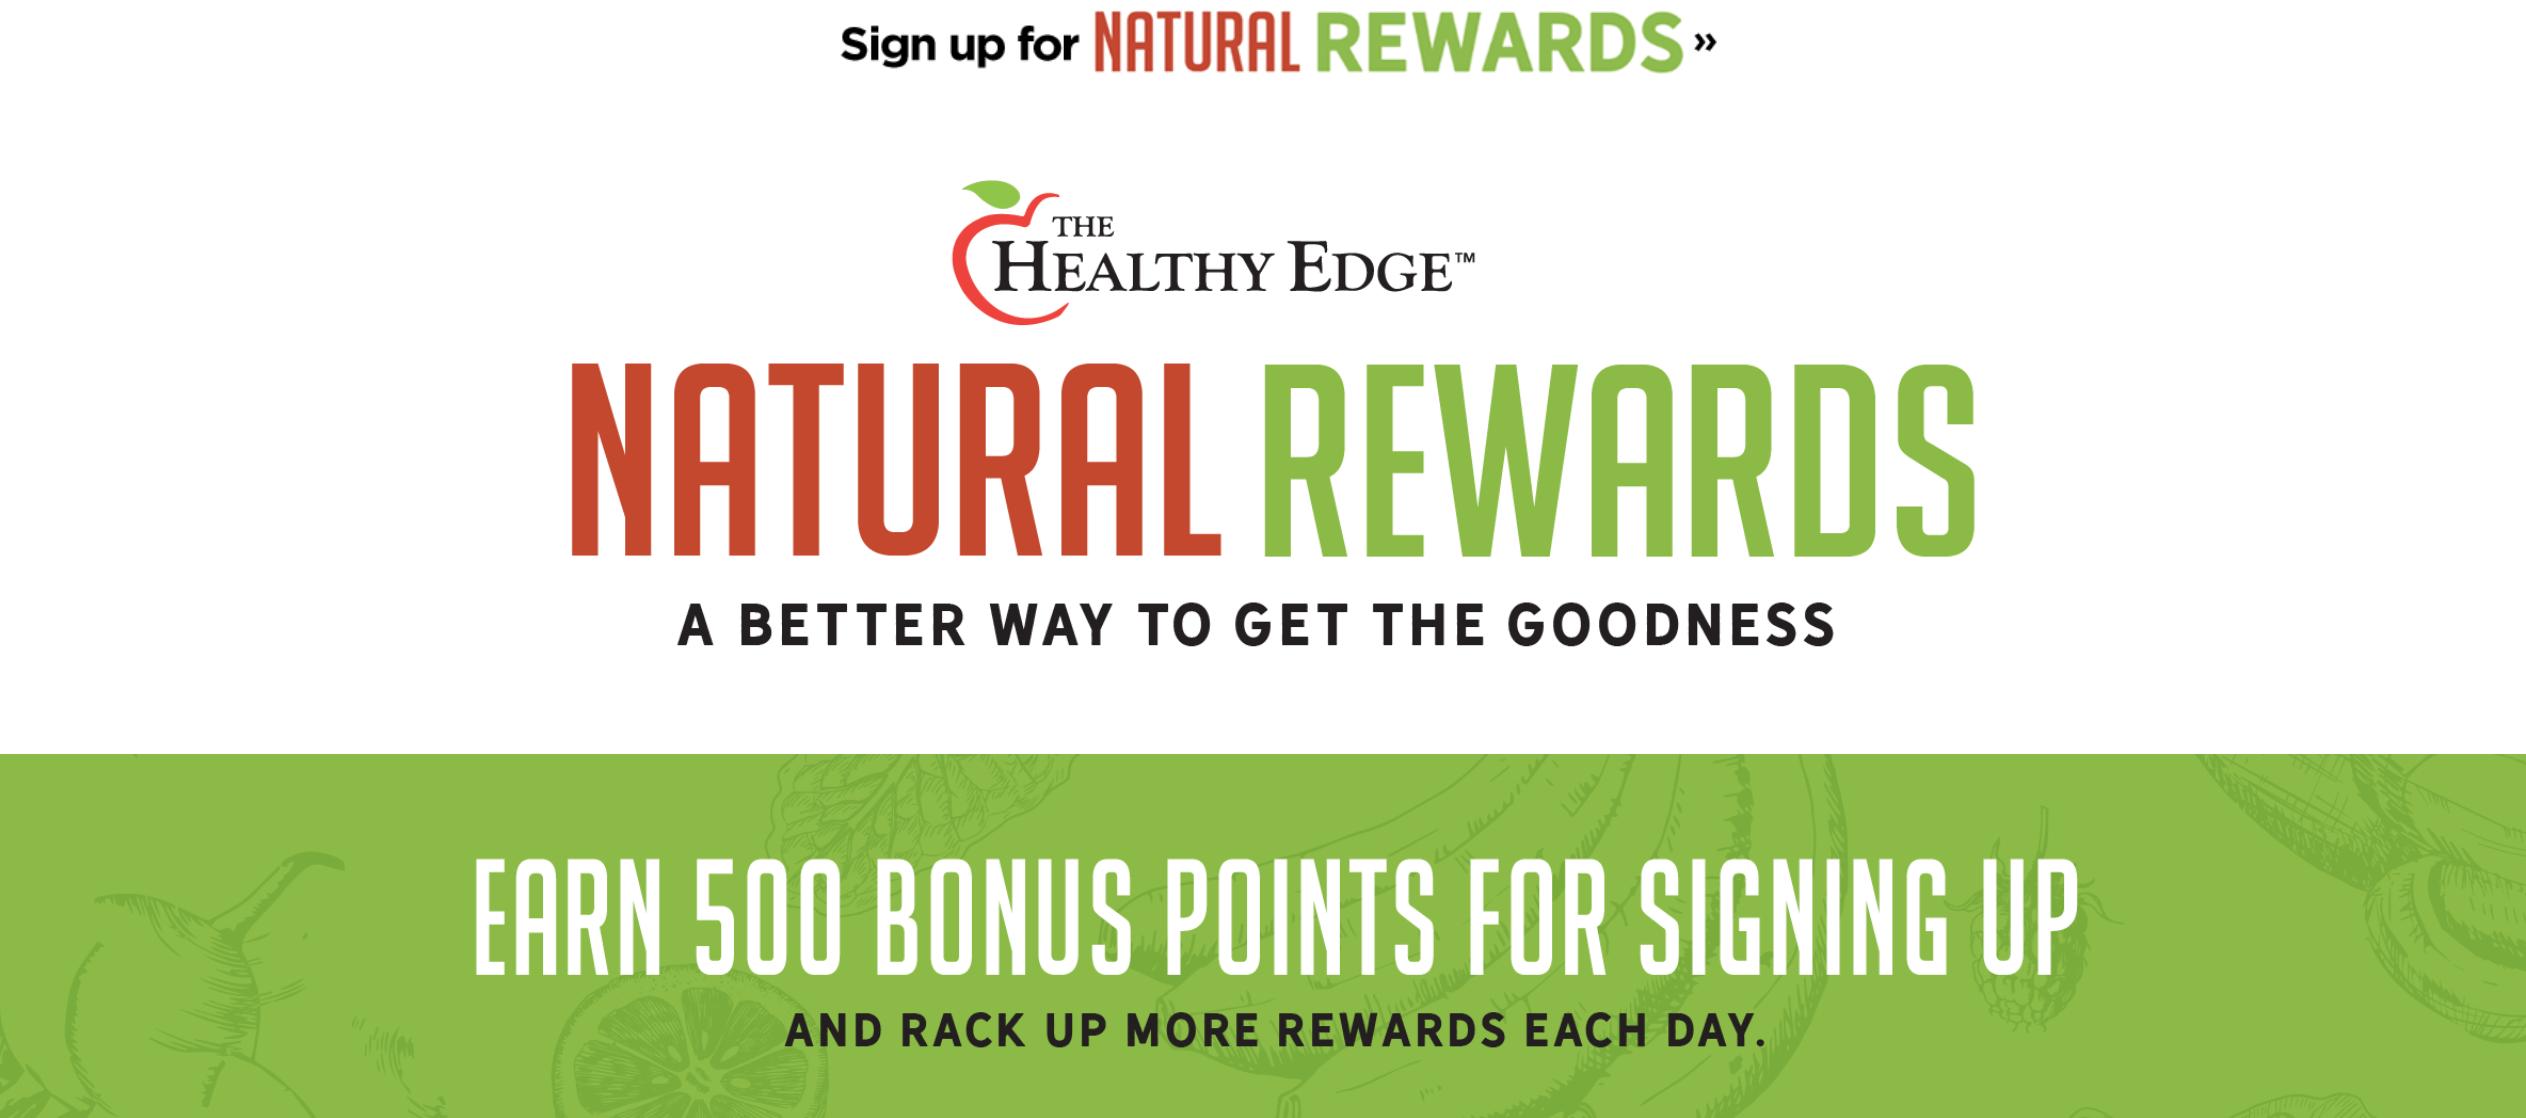 Natural Rewards